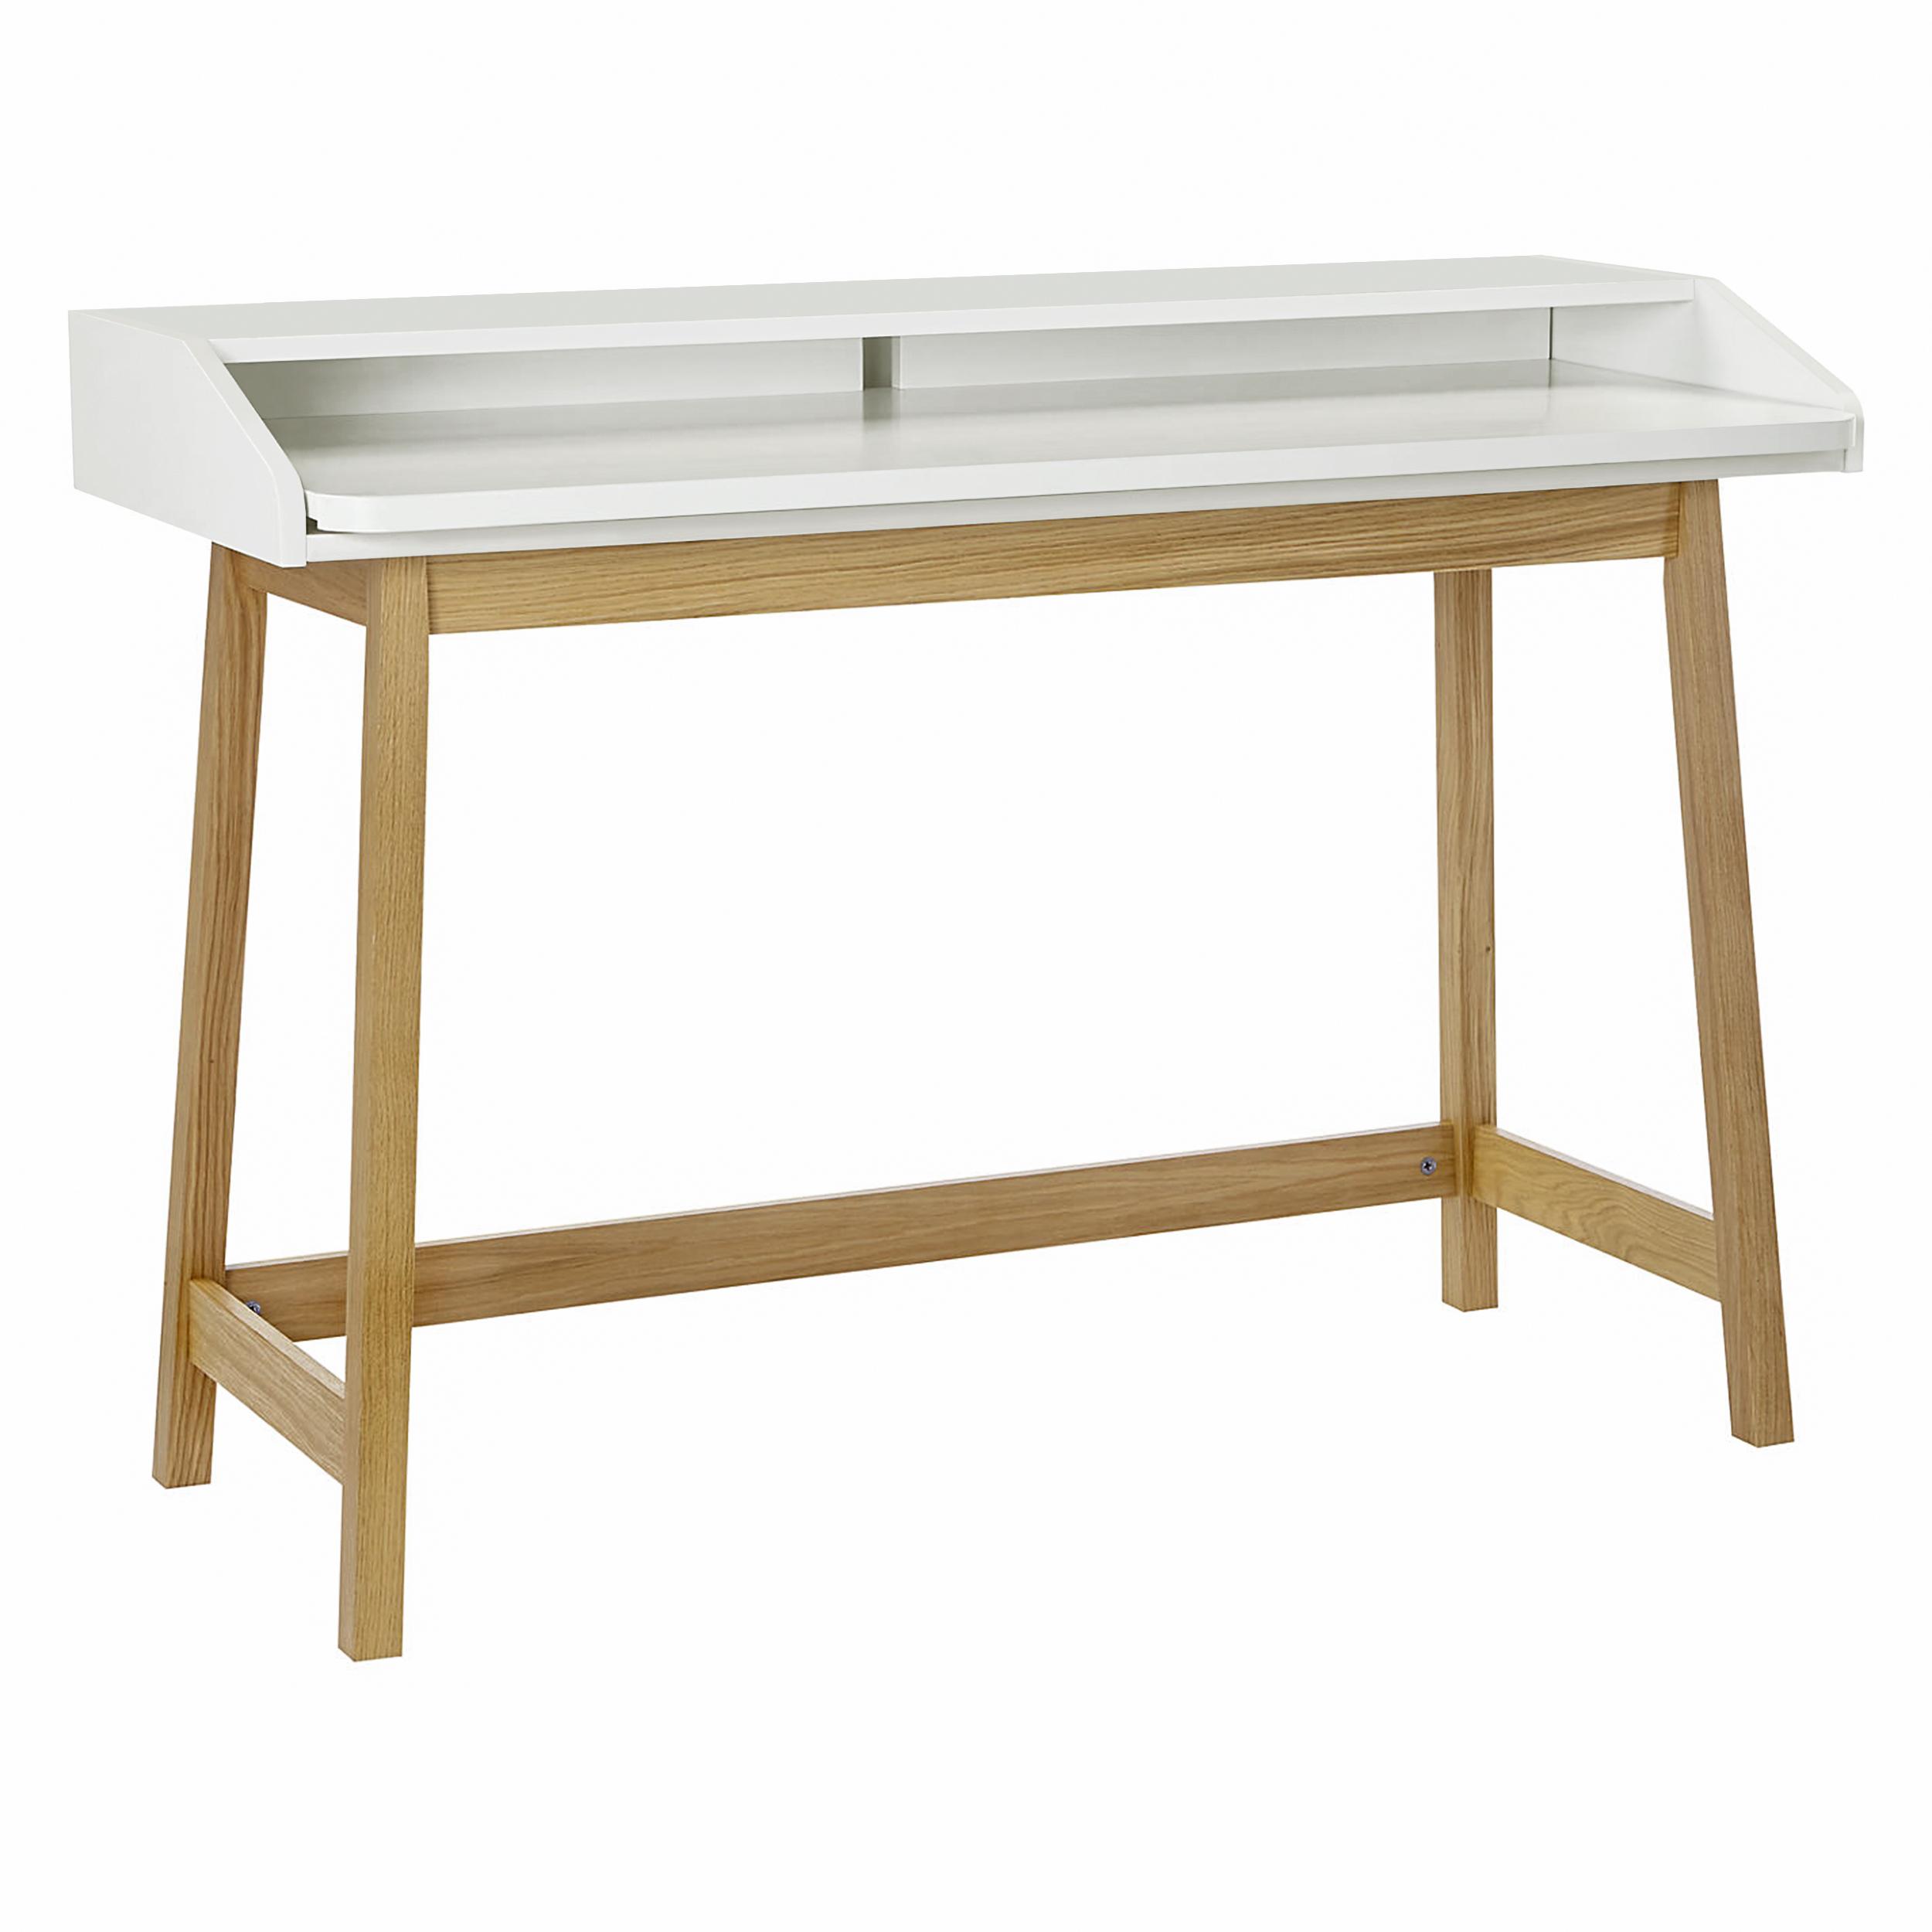 114001008014 St James Compact Desk White 01